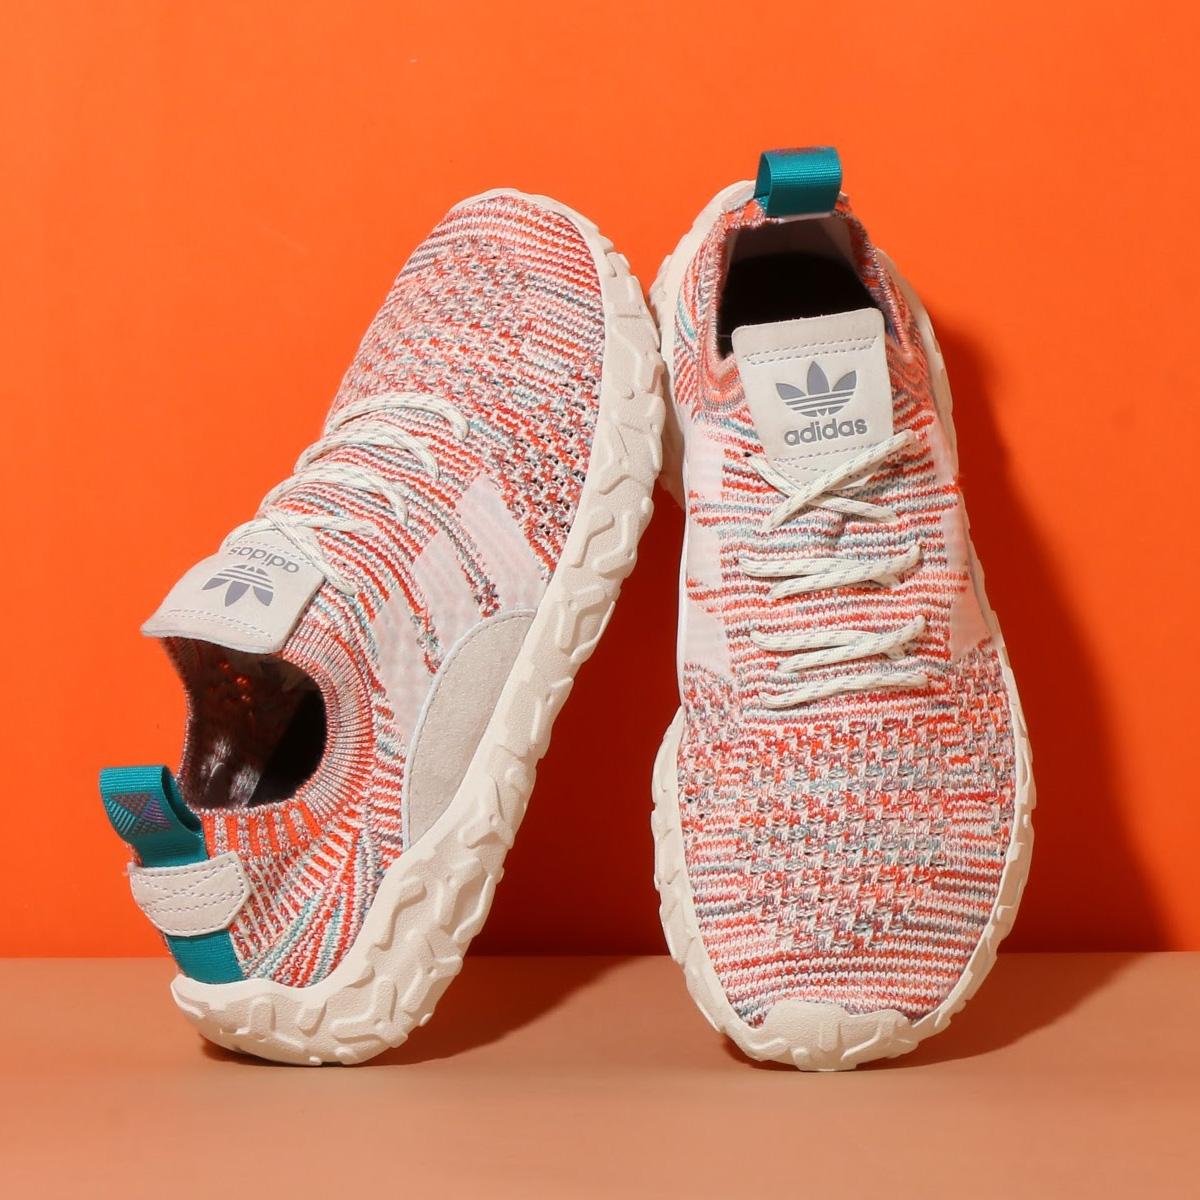 adidas Originals F/22 PK(アディダス オリジナルス F/22 PK)Trase Orange/Crystal White/Running White【メンズ スニーカー】18SS-I